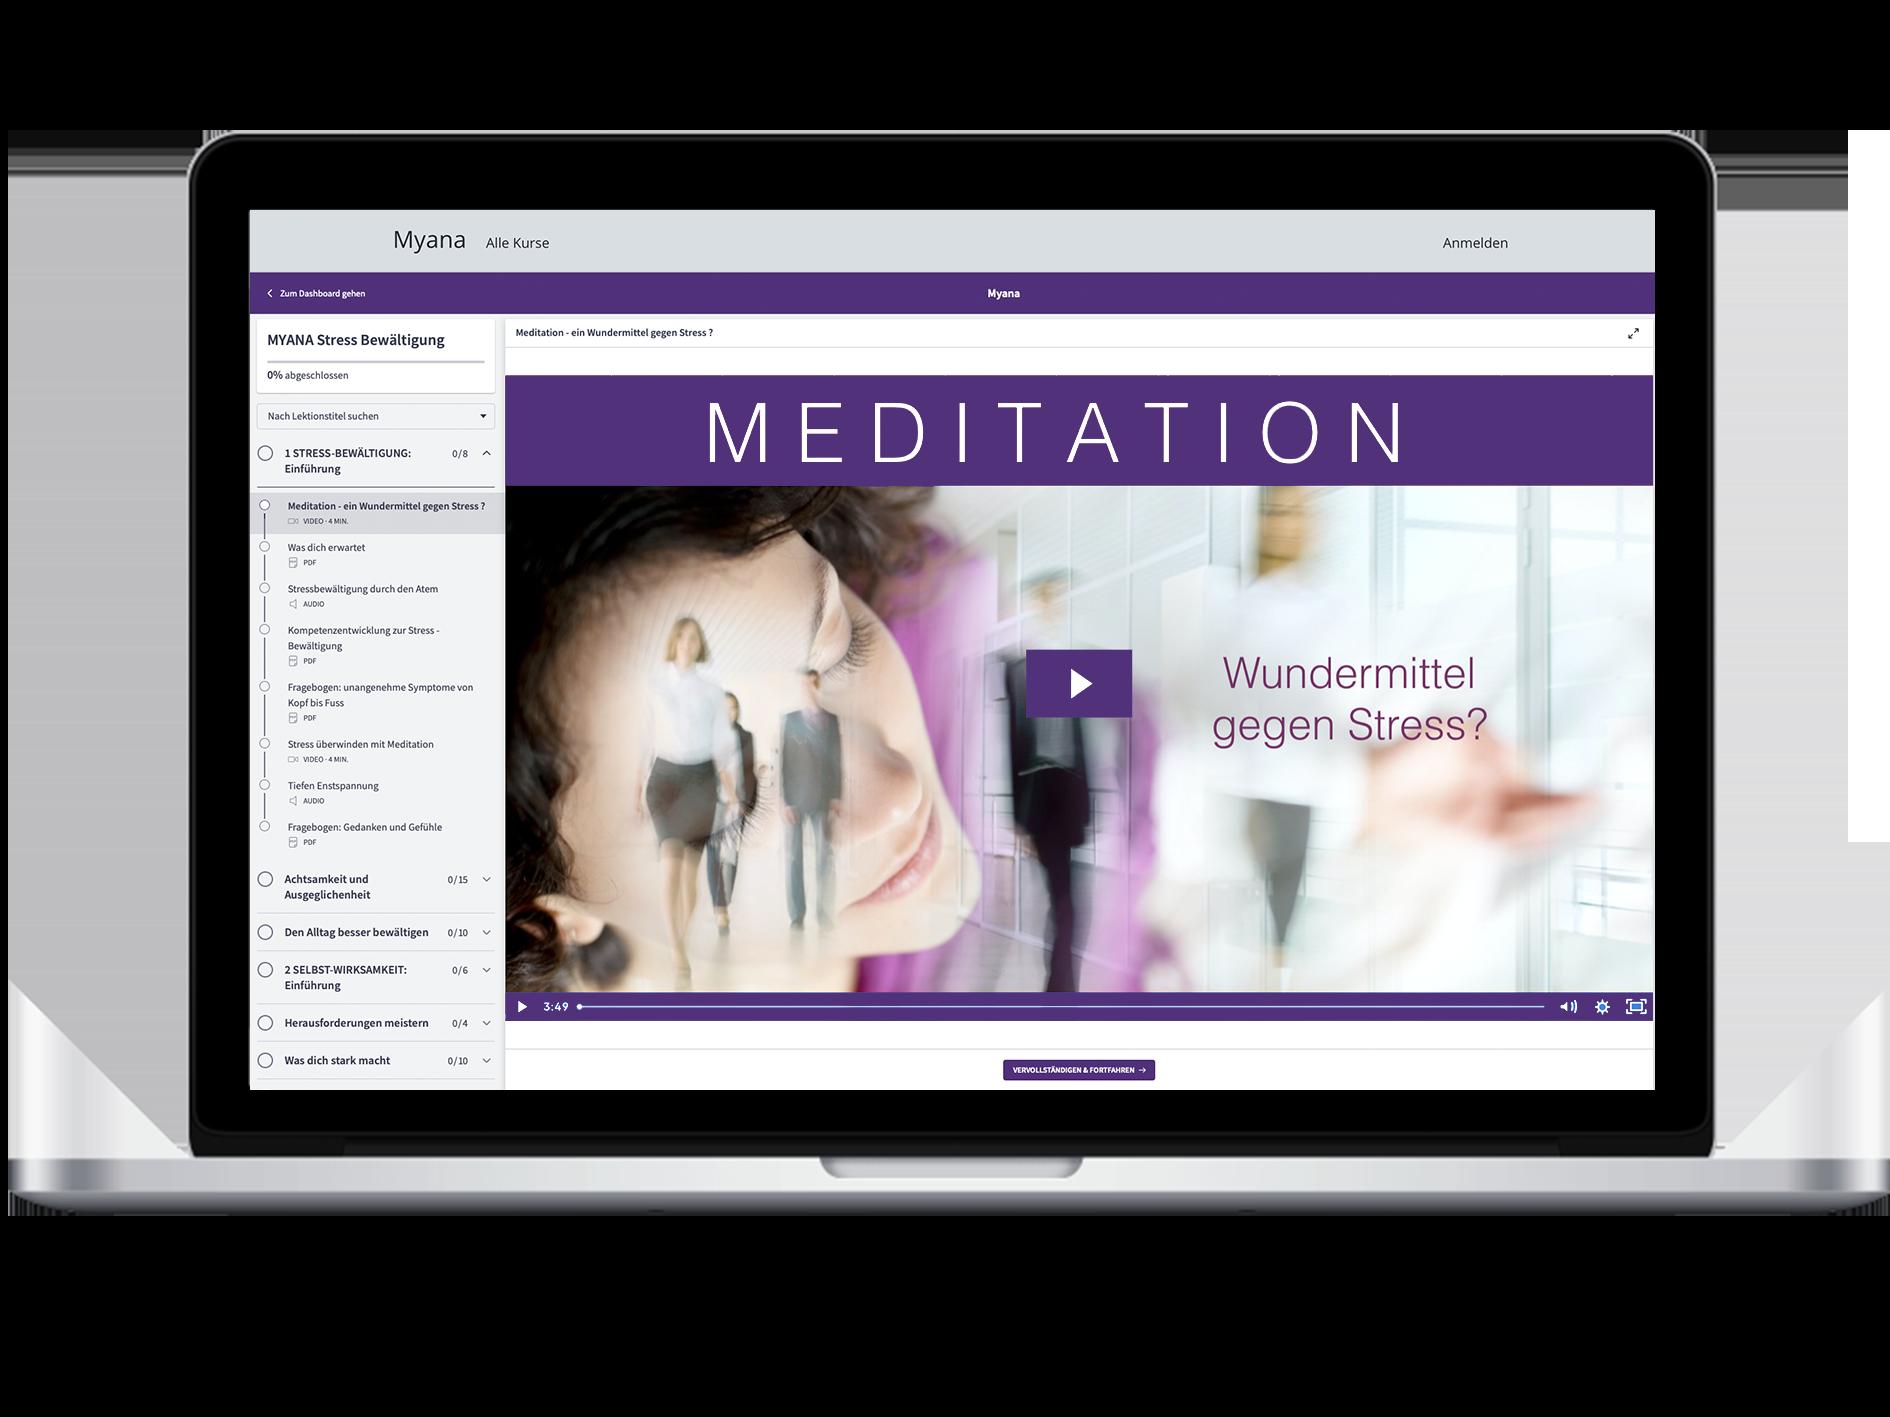 Myana dein Meditations Online Kurs